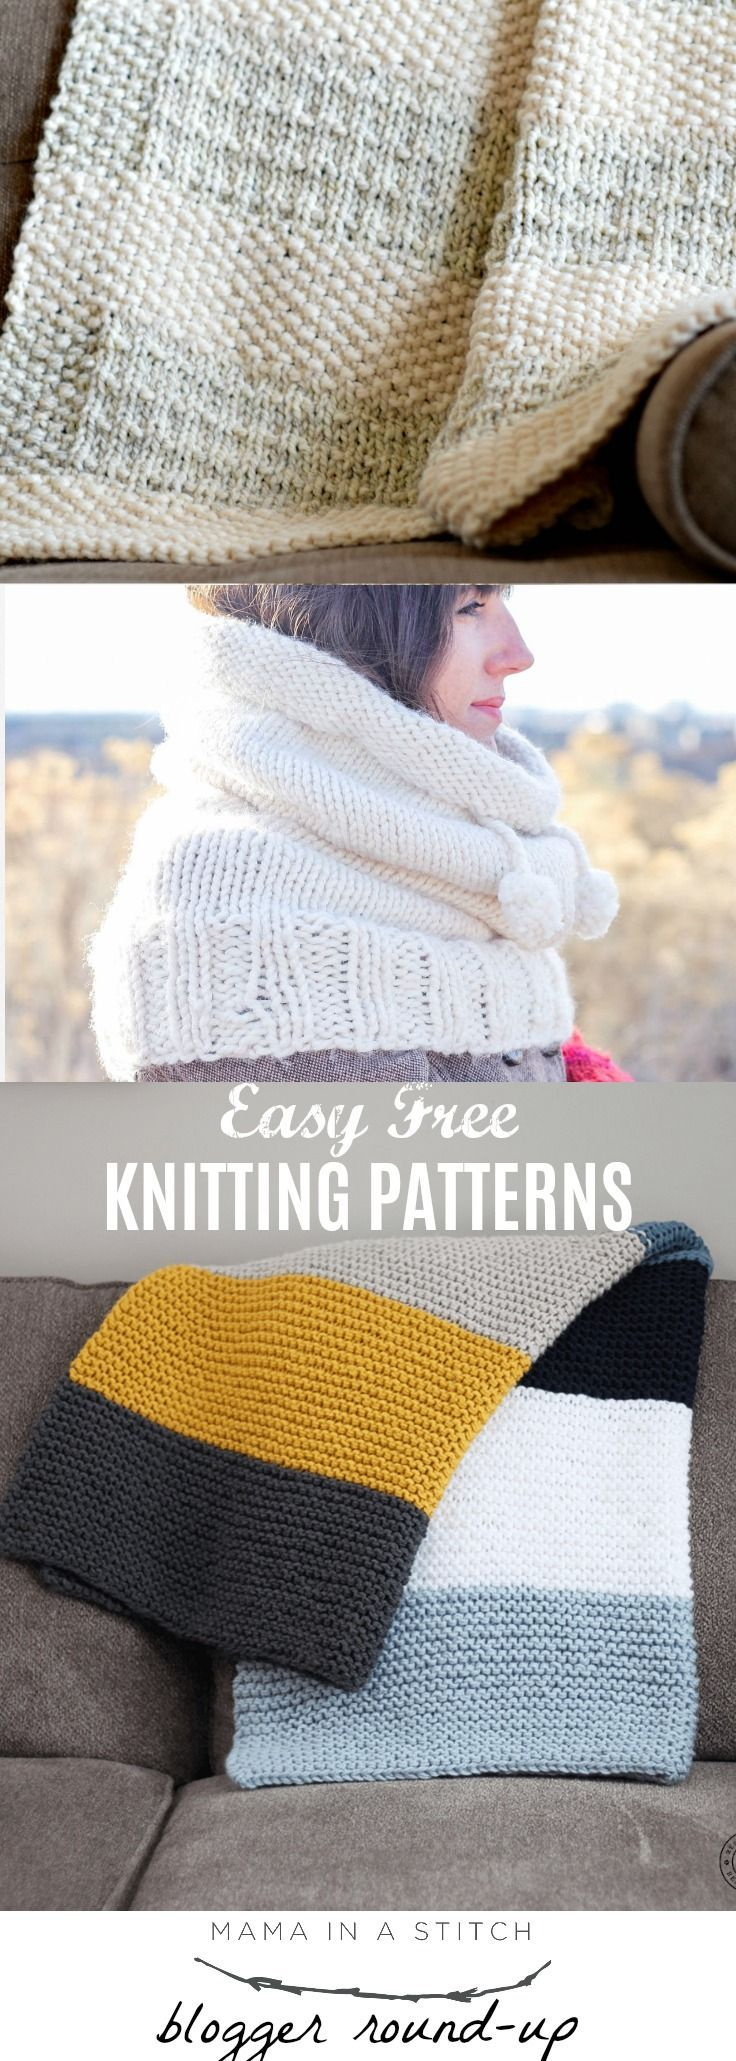 3837 best Pretty Knitting Patterns images on Pinterest | Knitting ...